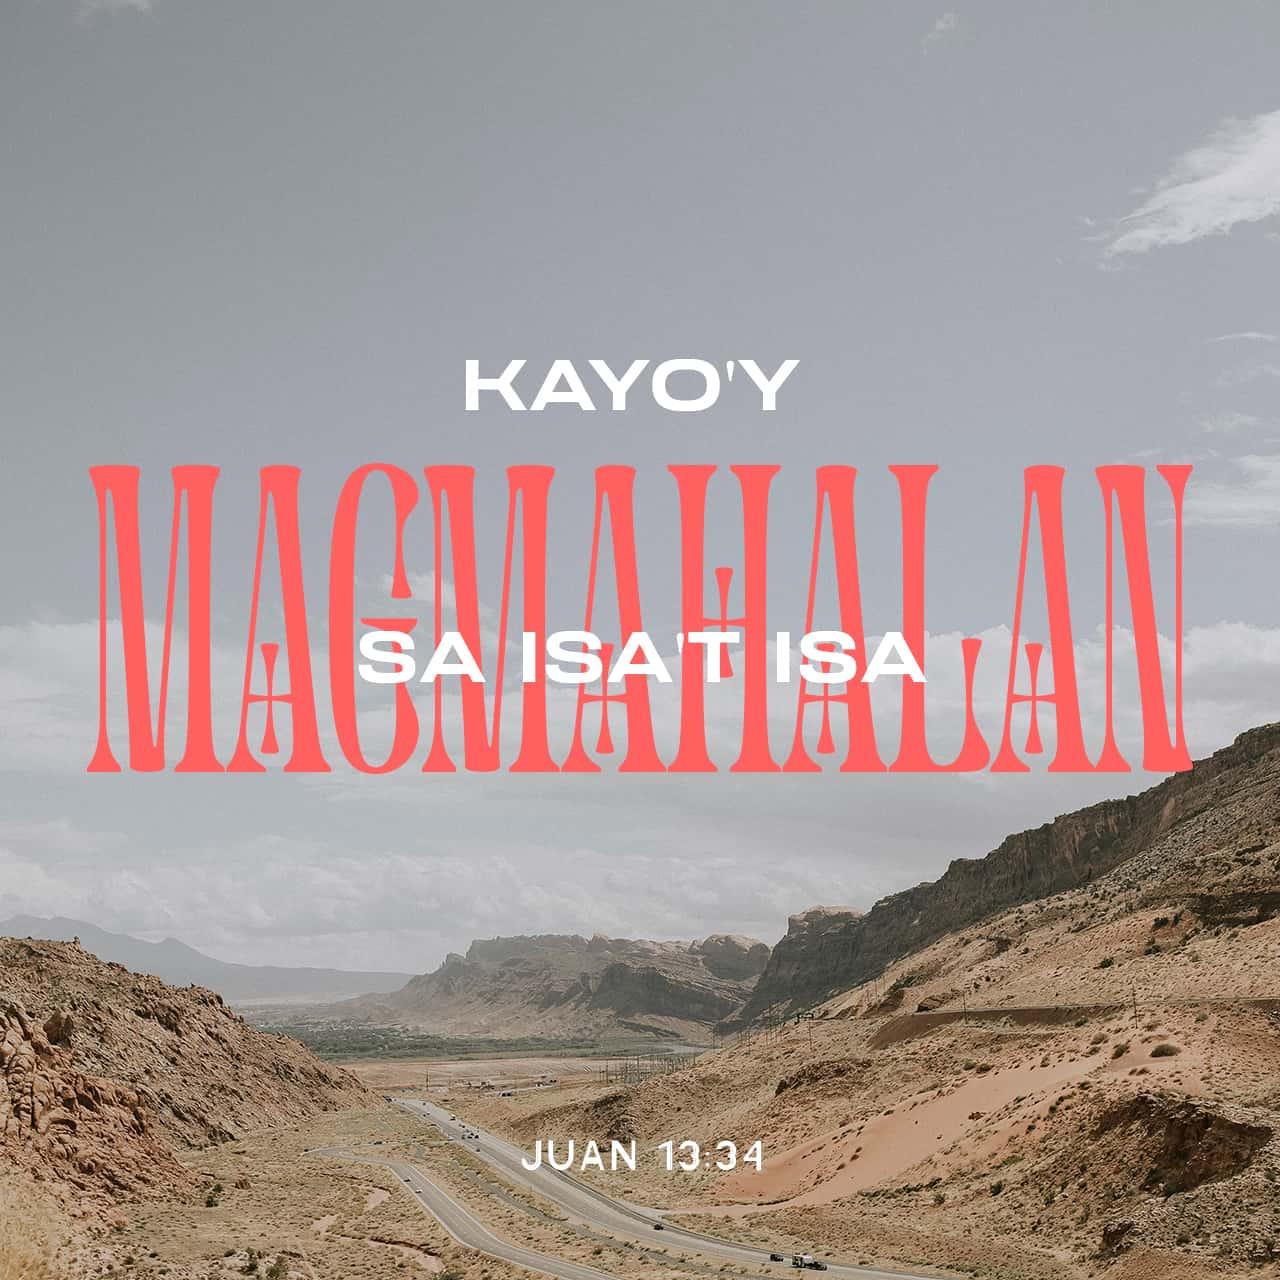 Mag-ibigan kayo - Juan 13:34 - Bersikulong Larawan